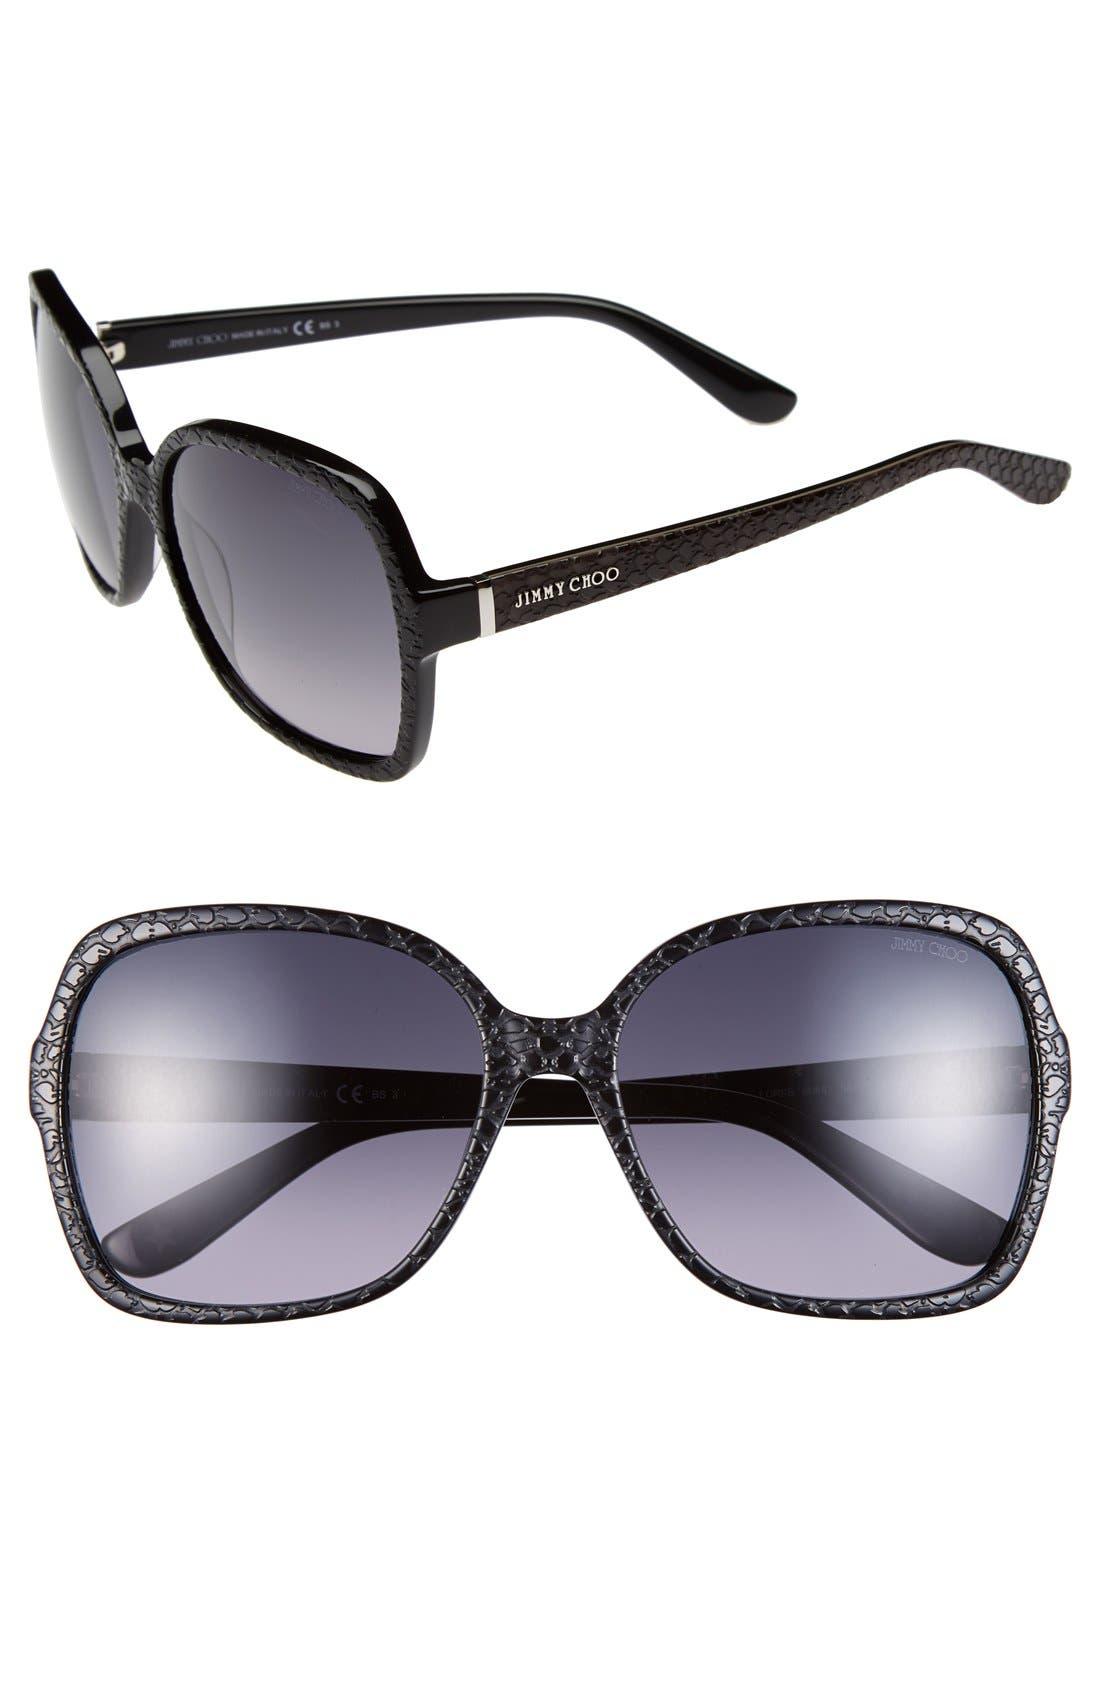 Main Image - Jimmy Choo 58mm Butterfly Sunglasses